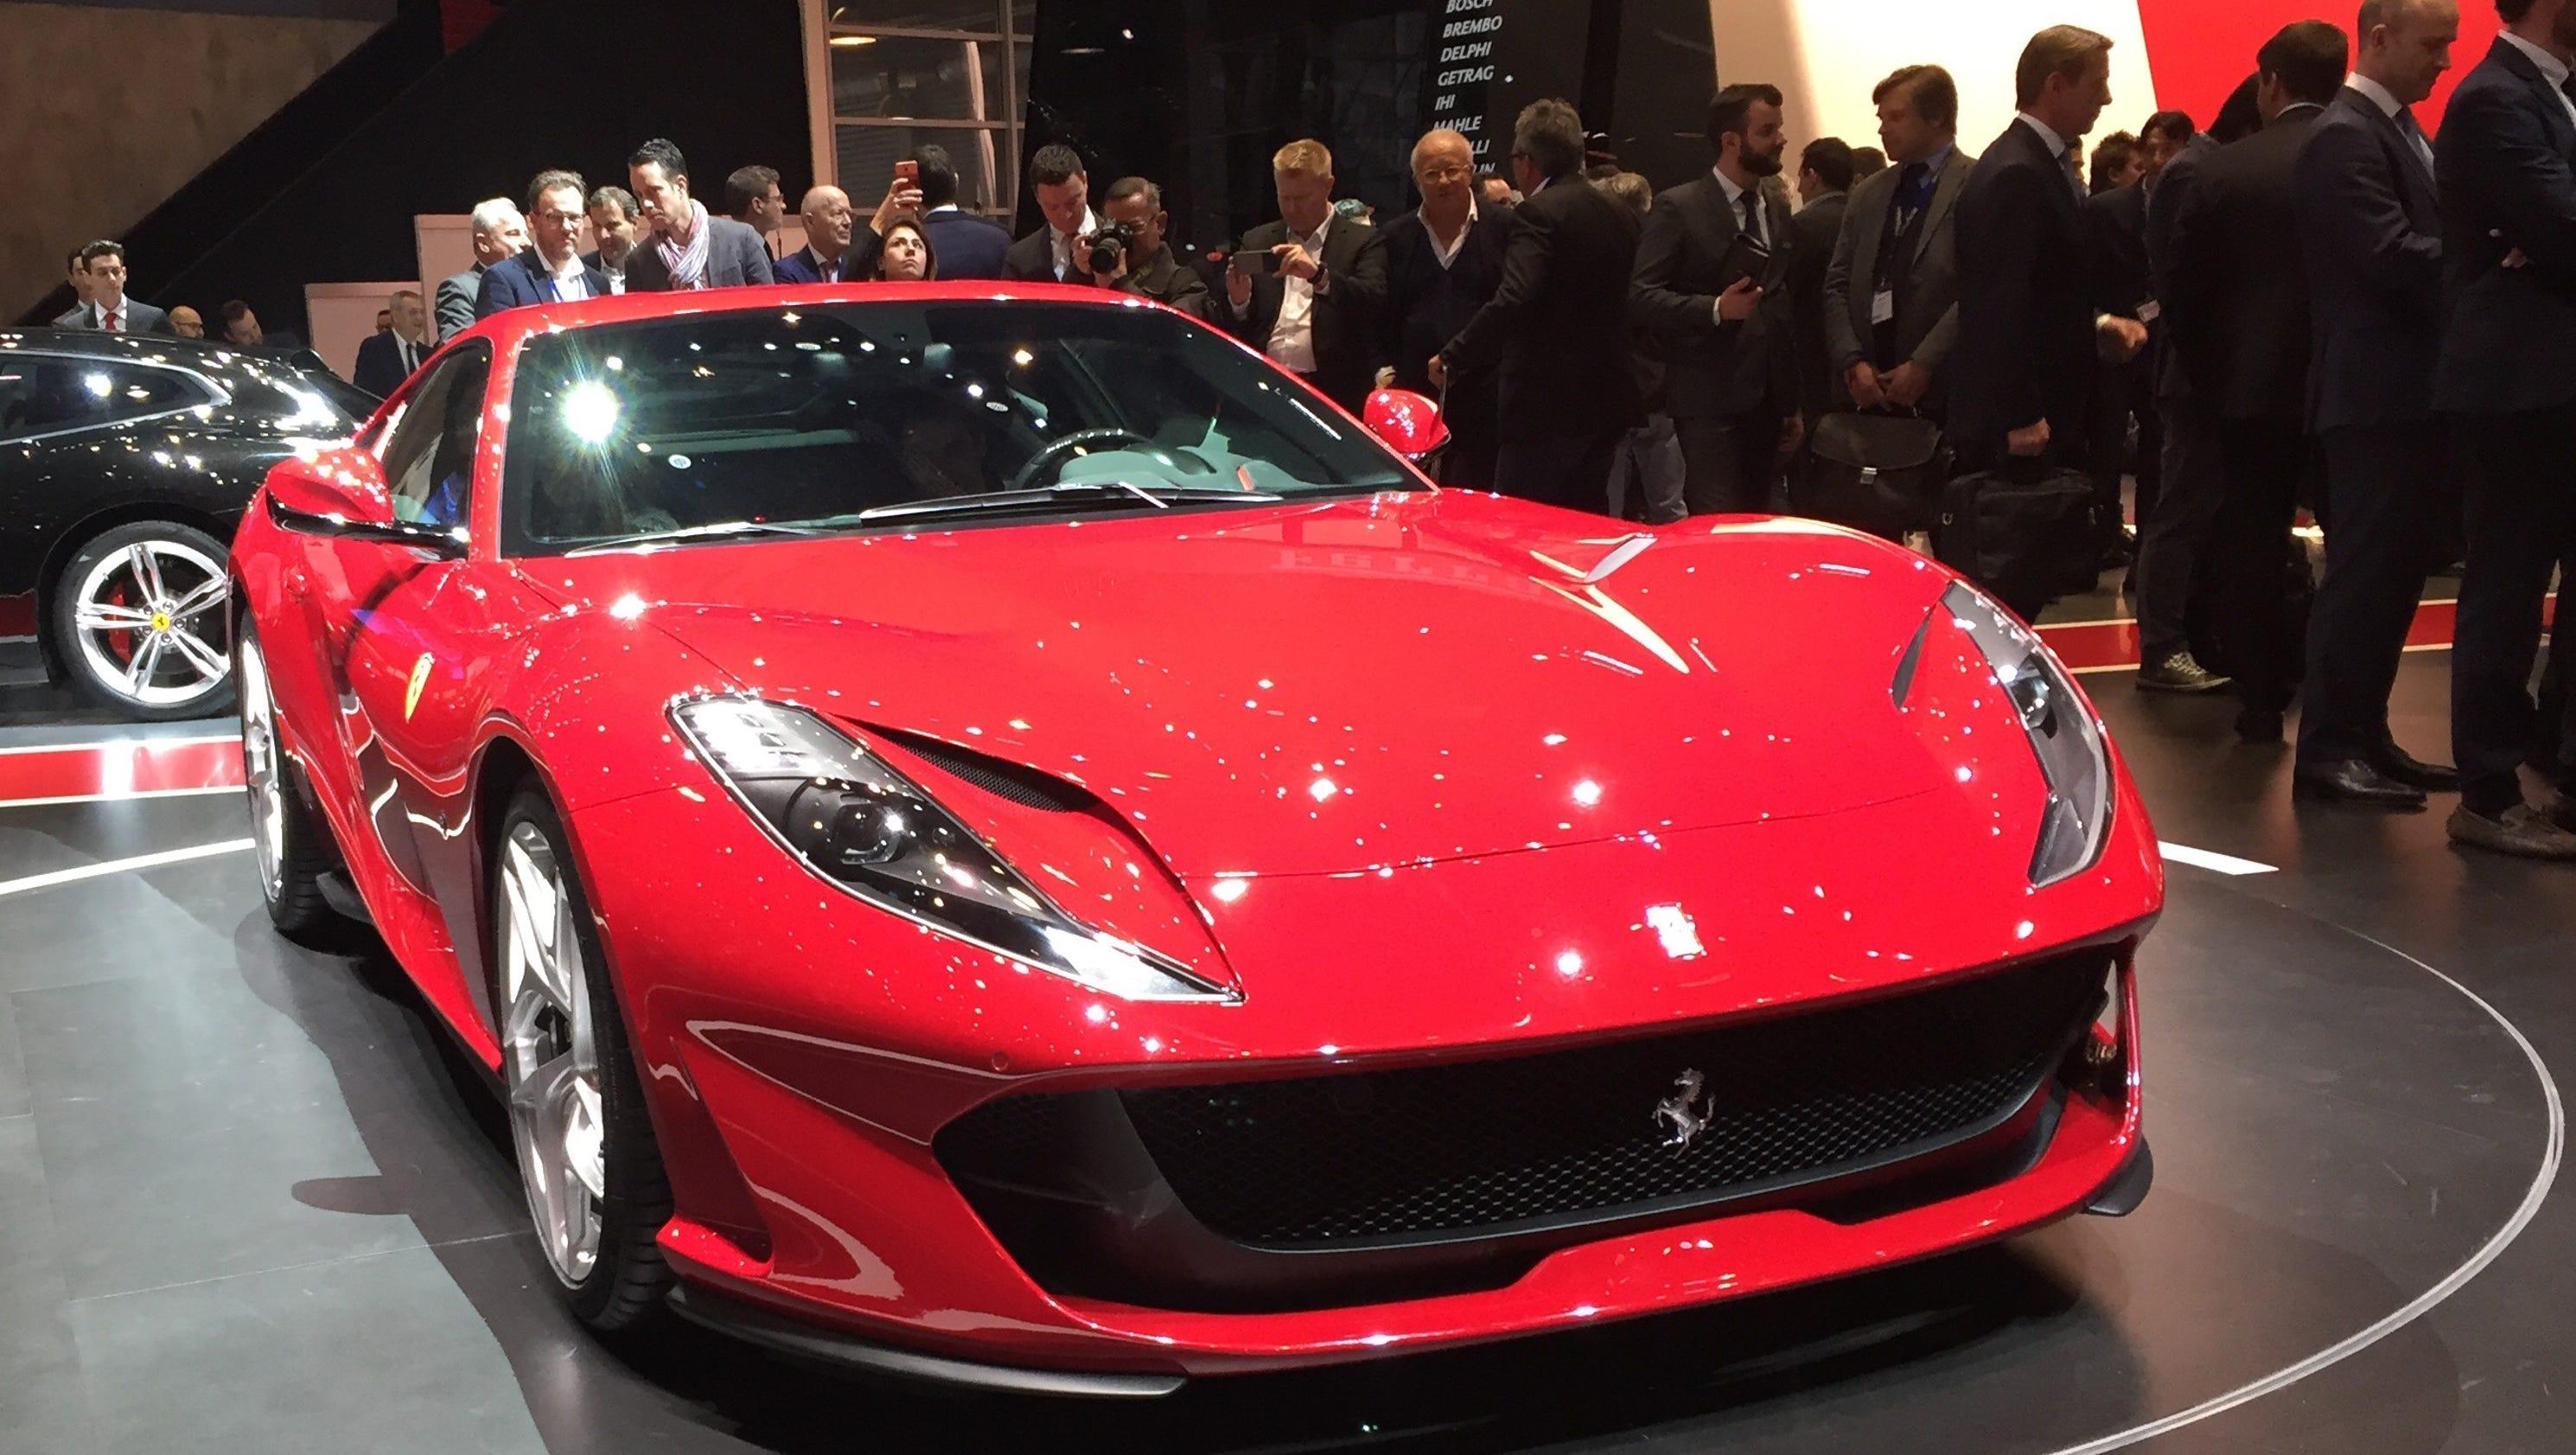 At 790 horsepower Ferrari s 812 Superfast is a beast